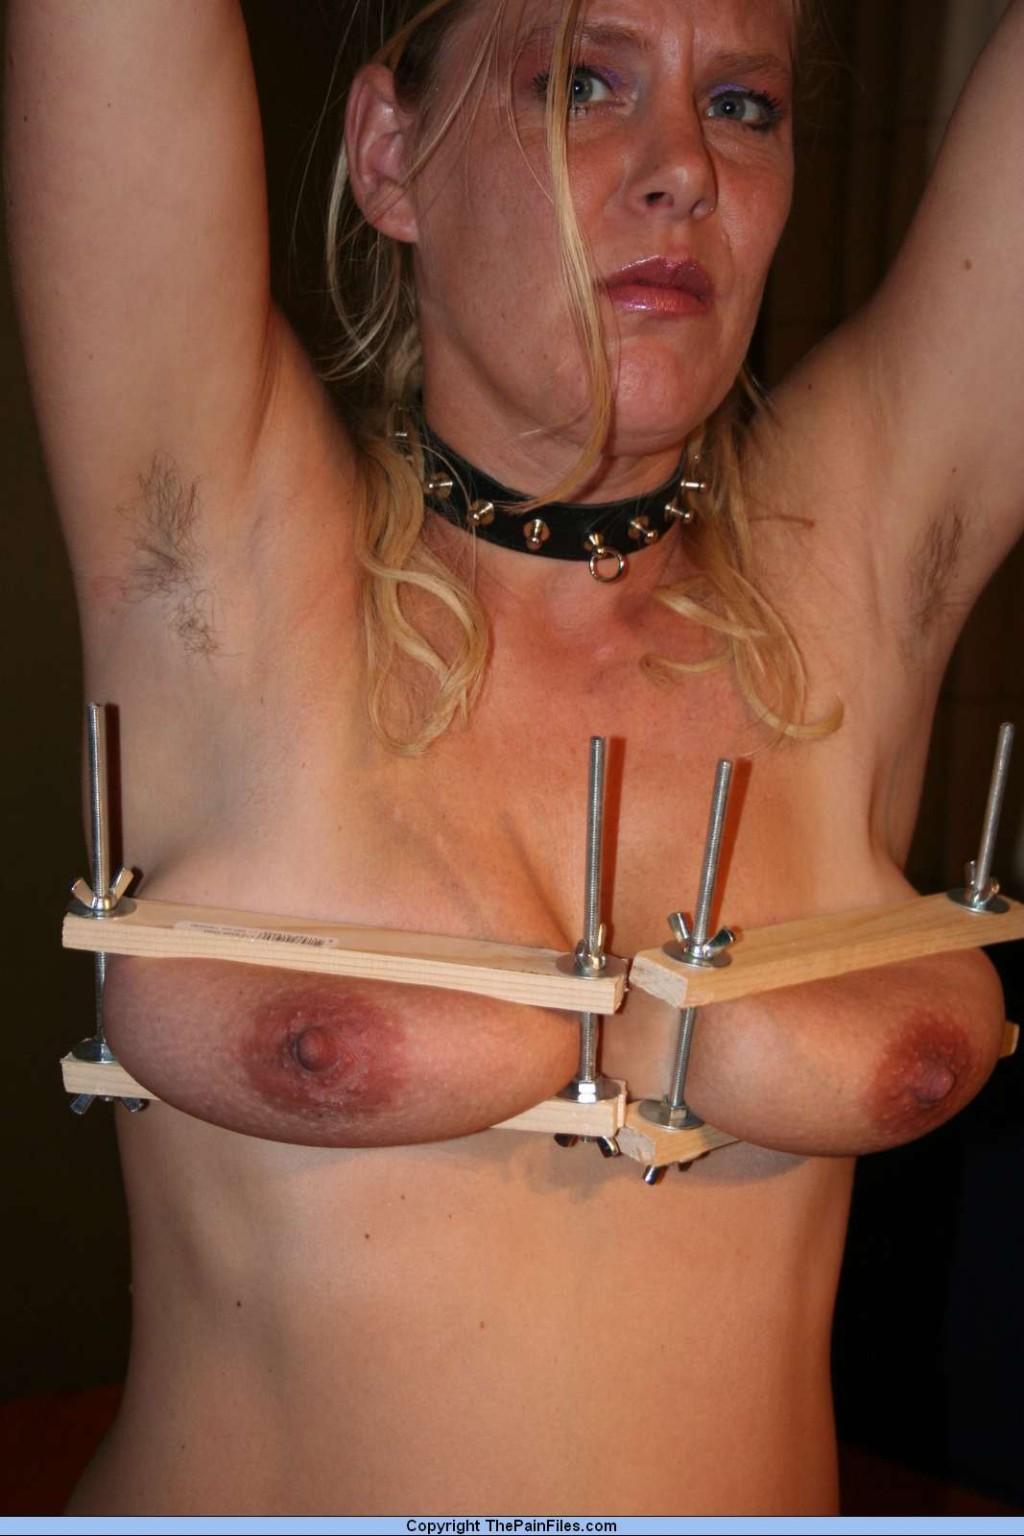 nude party drunk tied